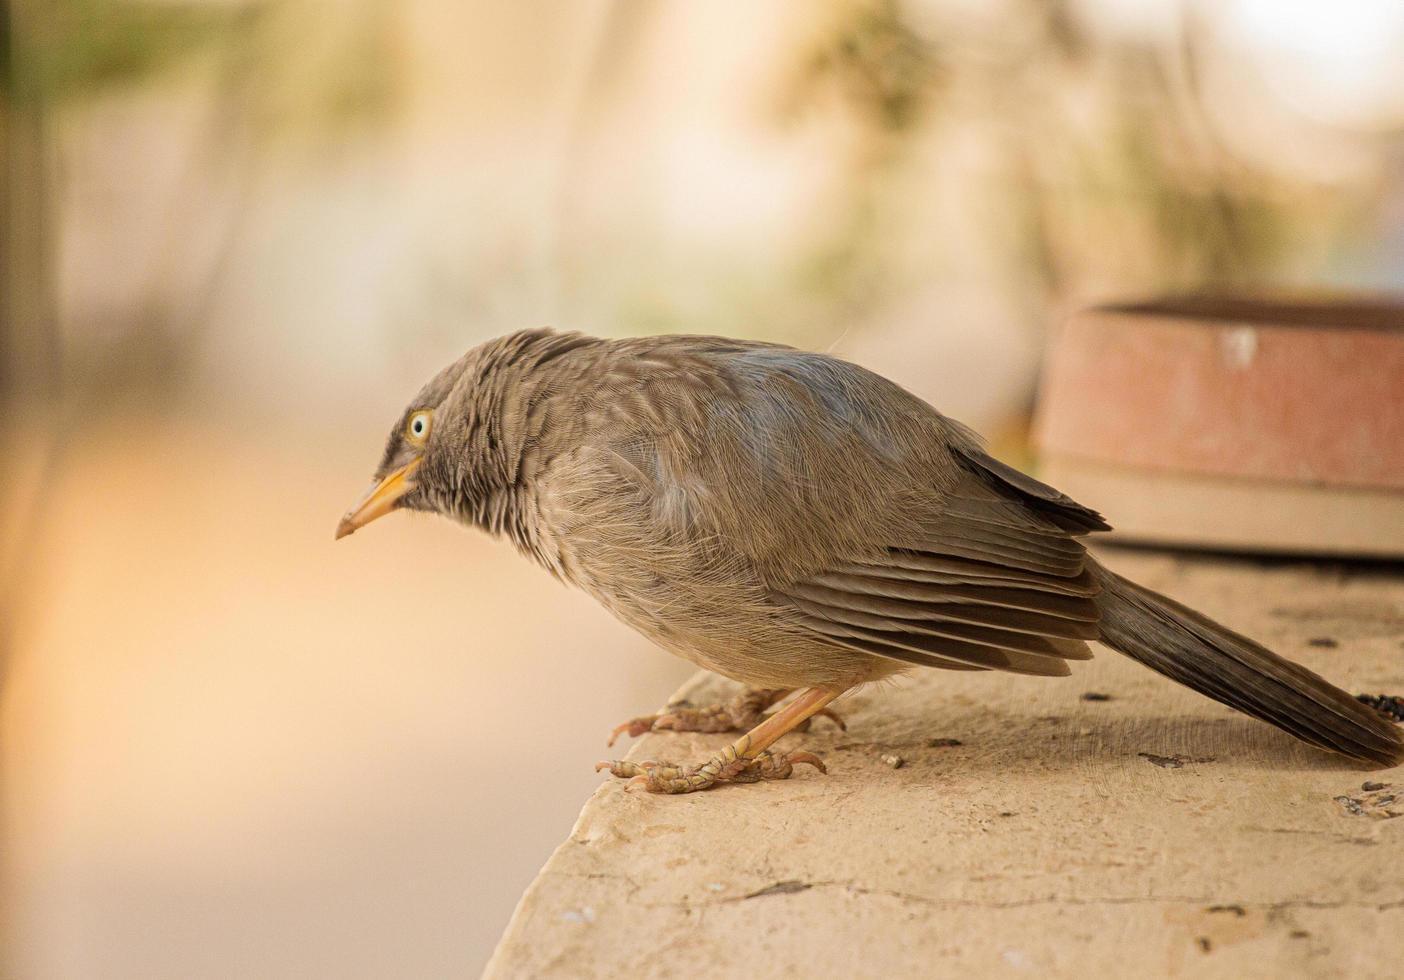 bruine vogel op beton foto